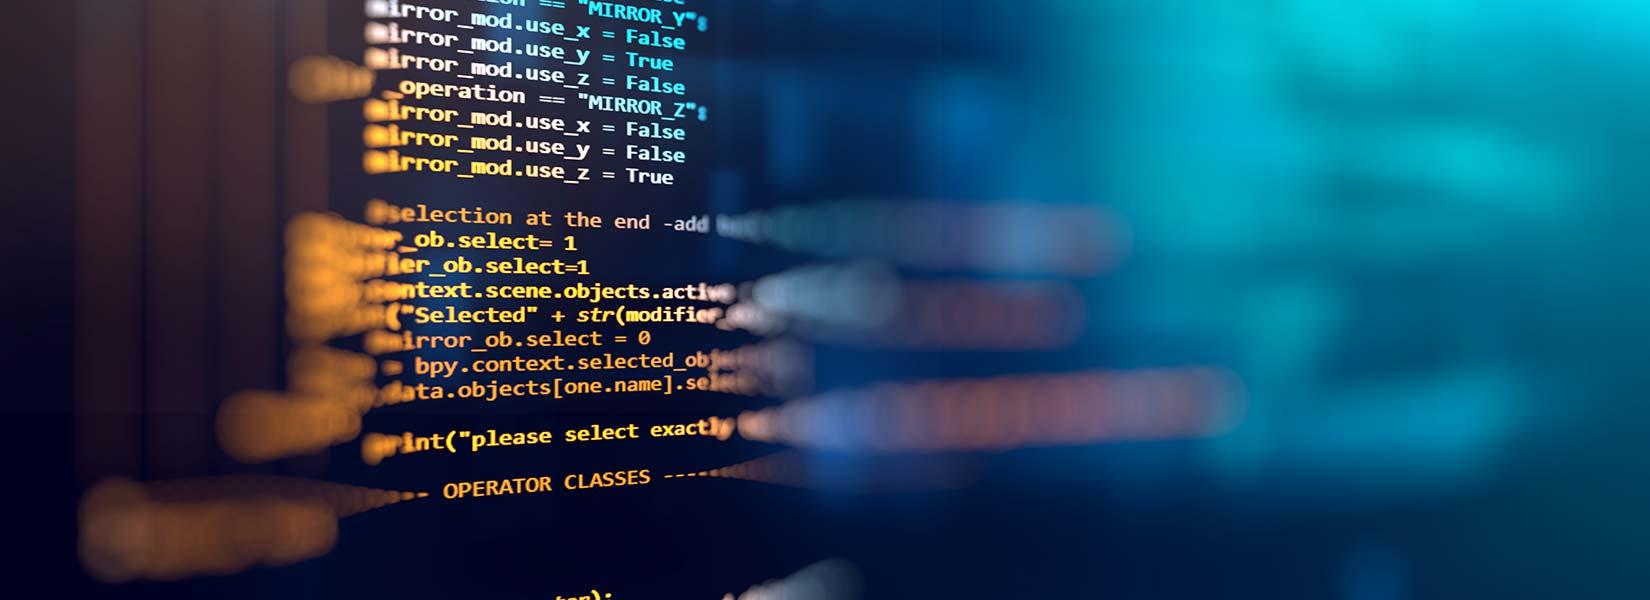 WordPress 4.7.5 Security Release